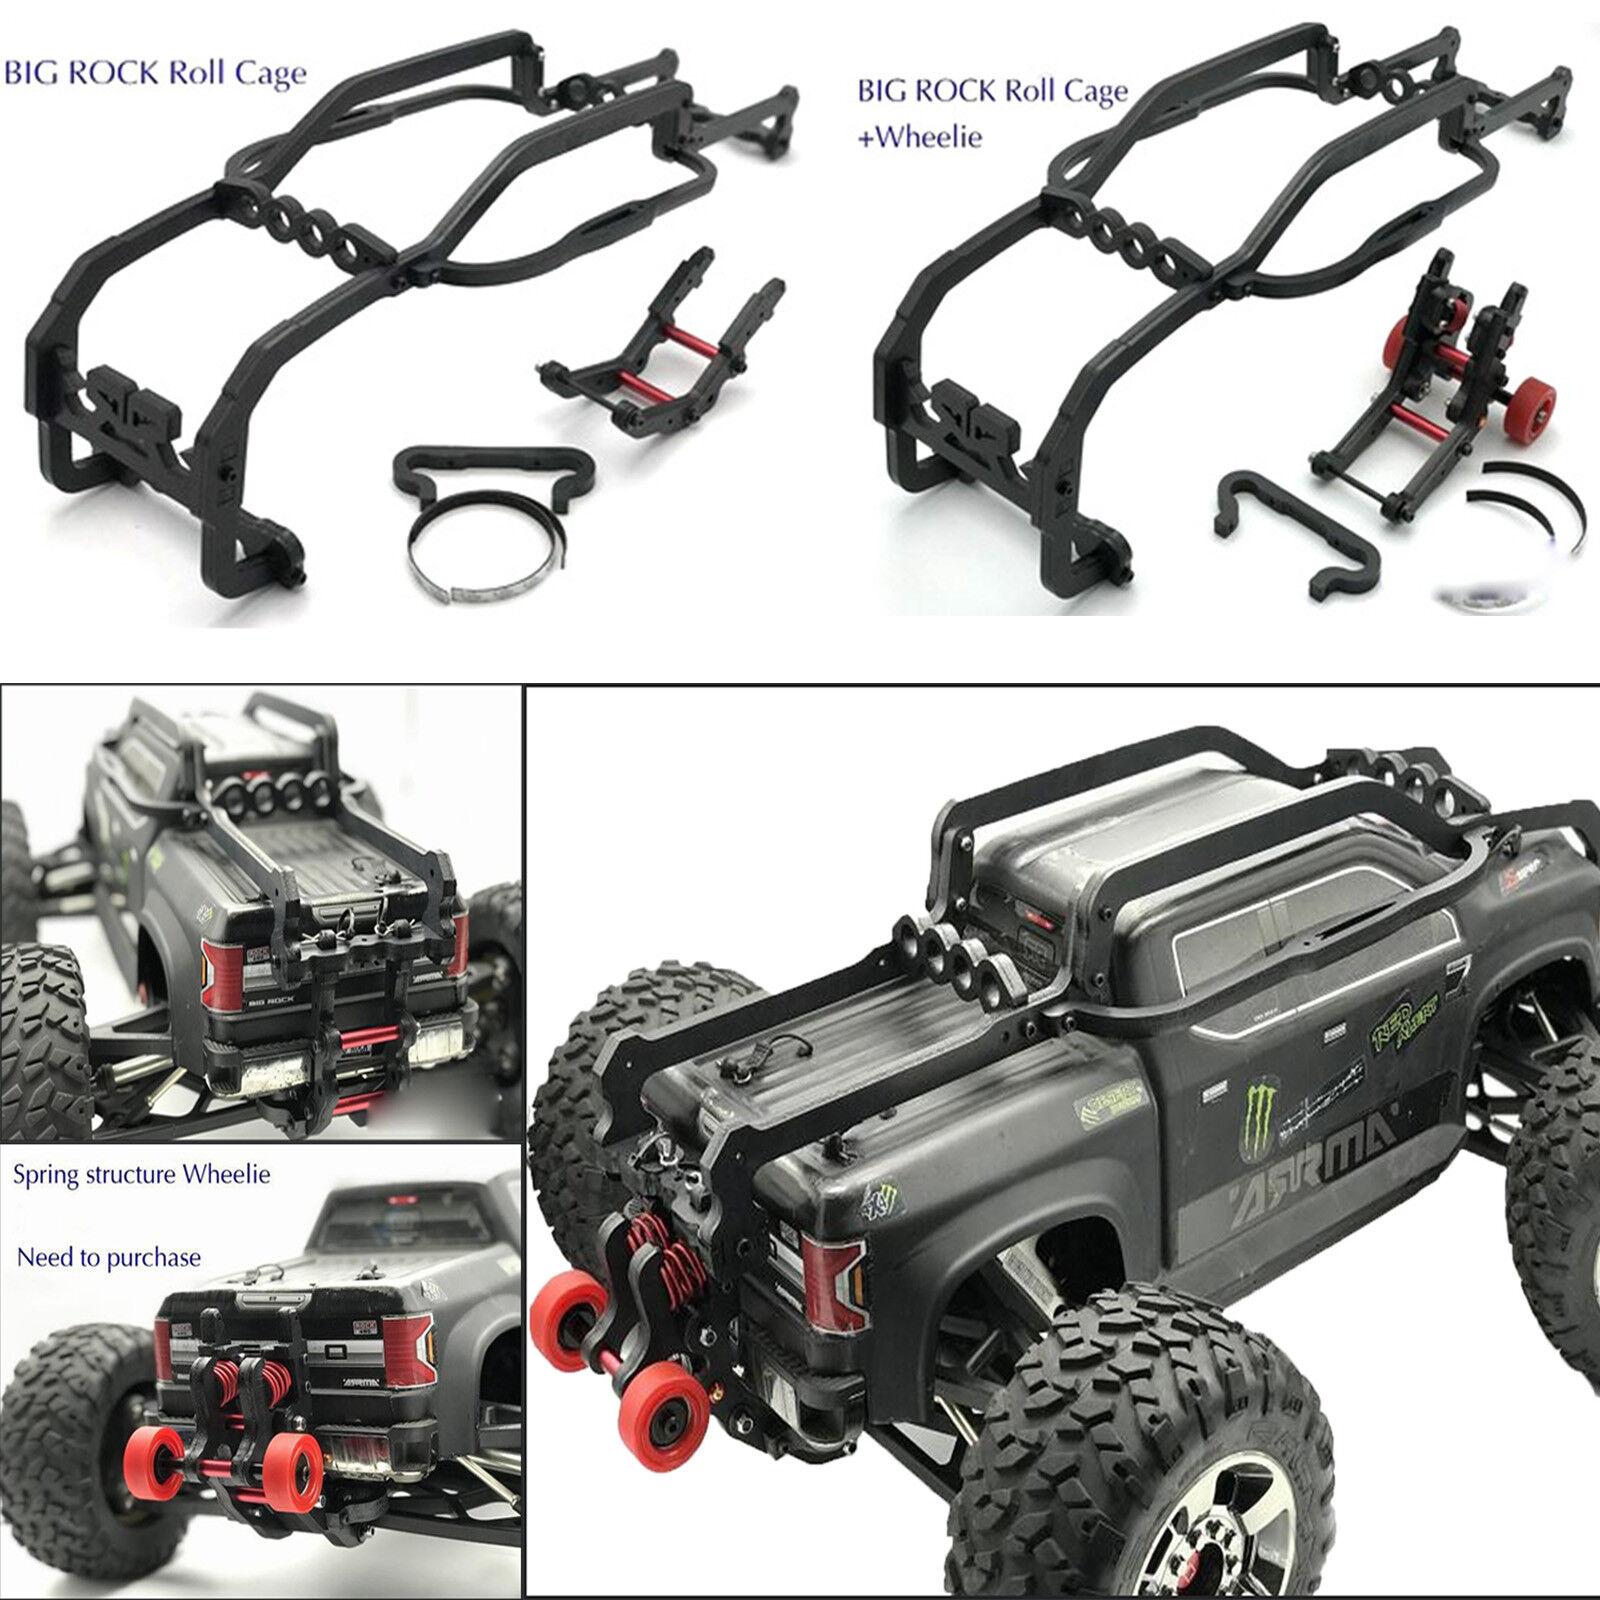 Para 1 8 Arrma negro Big Rock RC coche marco Body Shell Roll Cage Quilla + Wheelie Bar